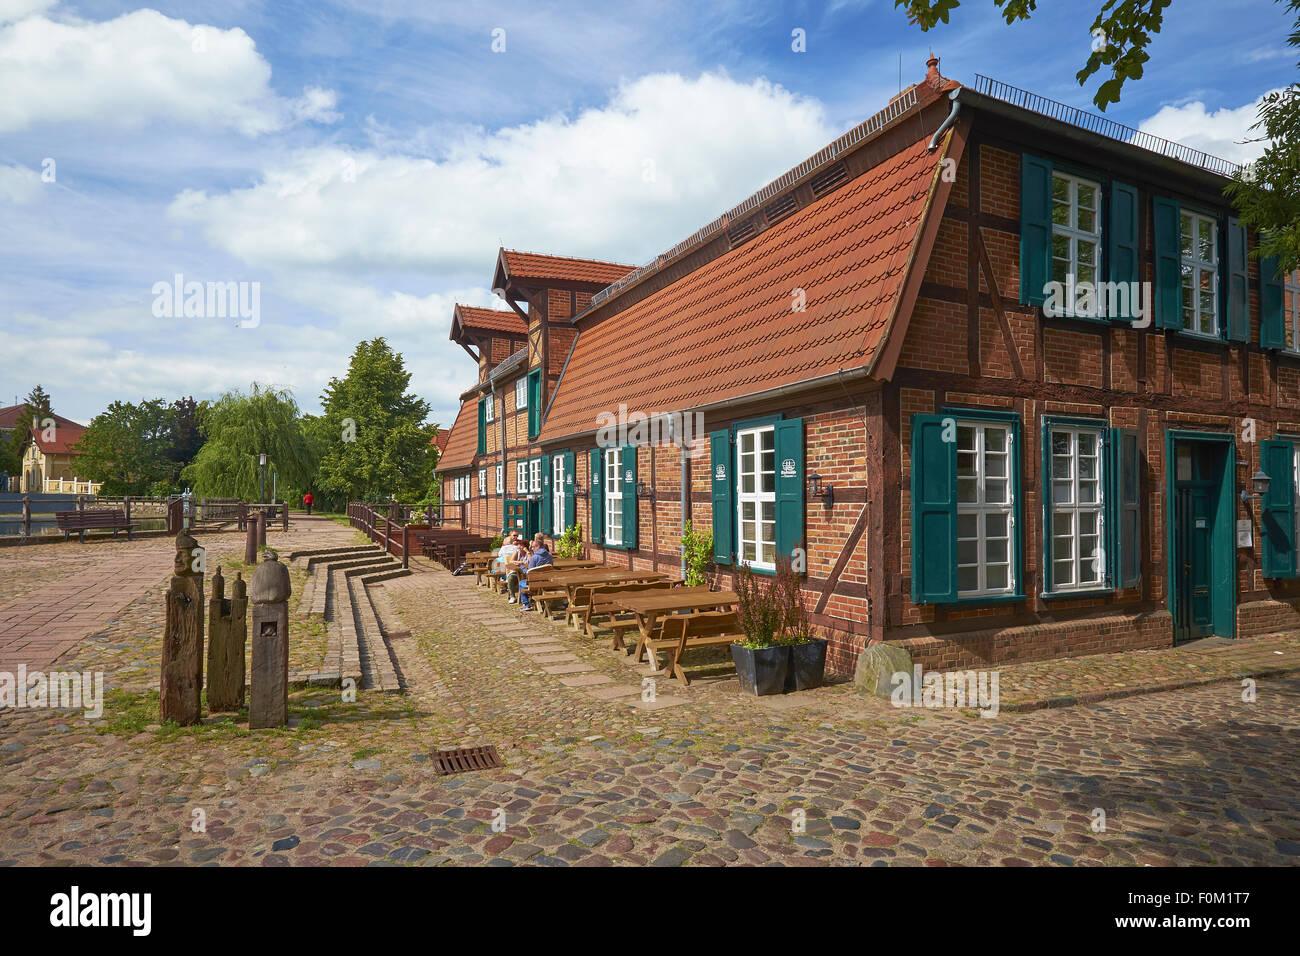 Town Mill in Teterow, Mecklenburg Western Pomerania, Germany Stock Photo